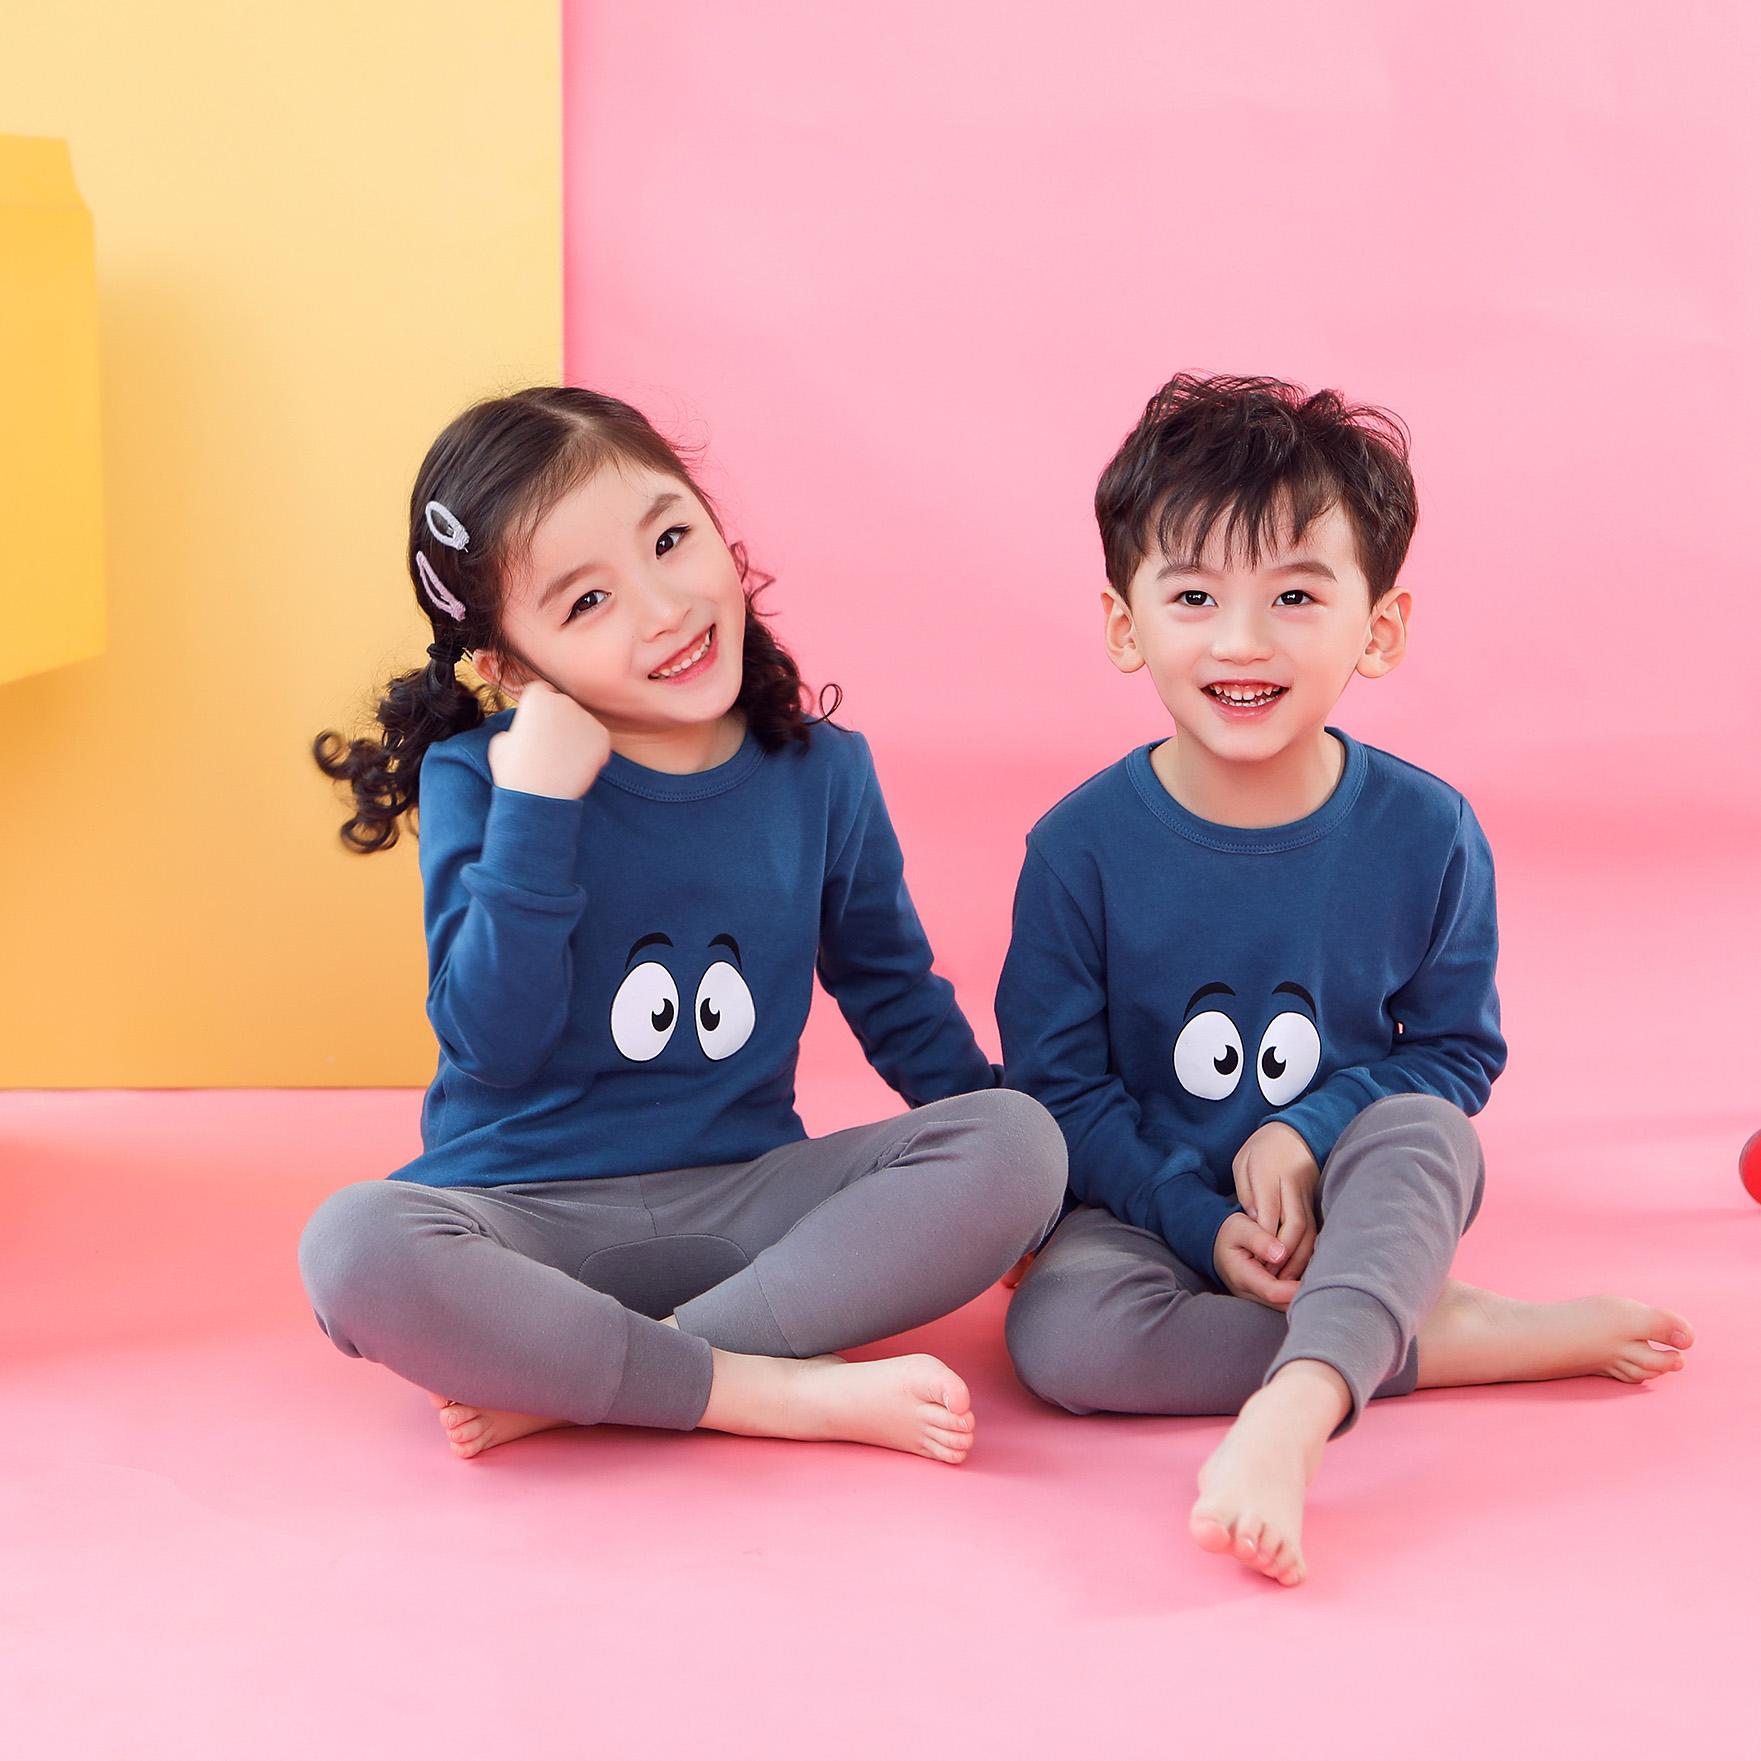 CY 162567 CHILDREN SUIT PASANG BUDAK PYJAMAS AIMEYA EYES 100-160